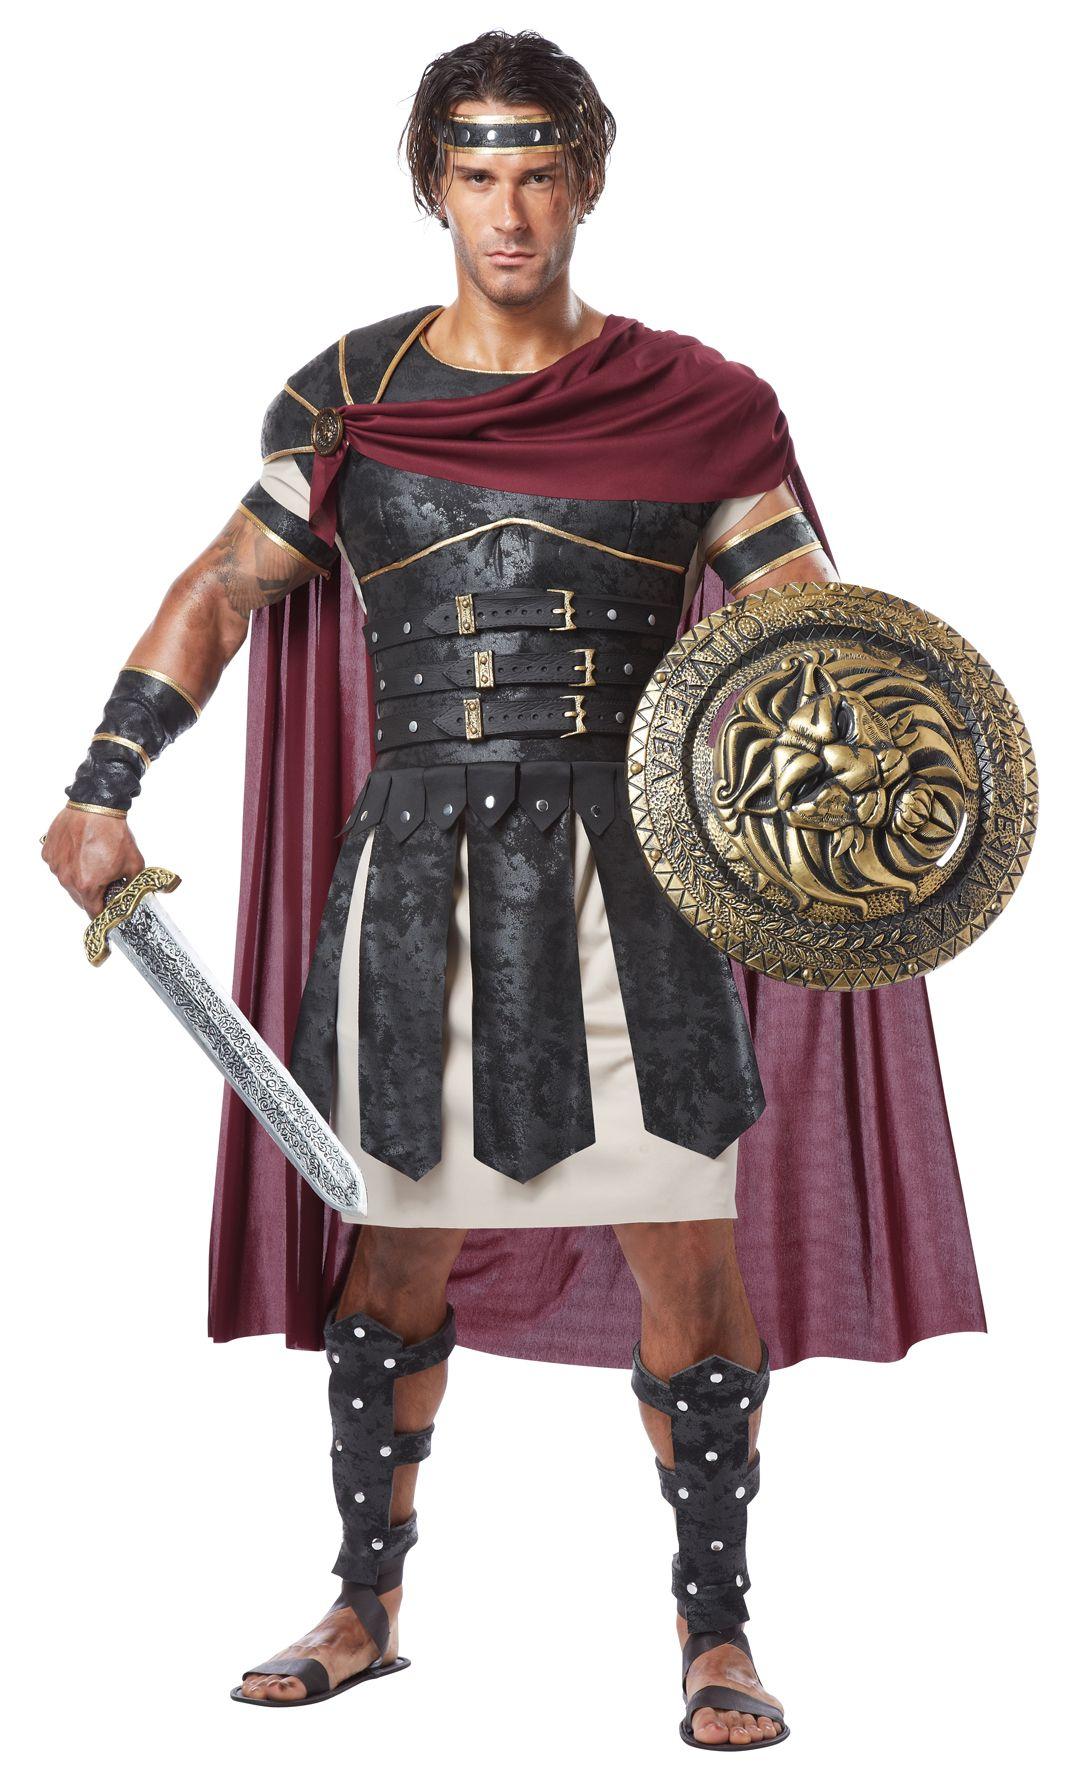 Menu0027s Roman Gladiator Greek Soldier Halloween Costume Set Cape Tunic Body Armor  sc 1 st  Pinterest & Menu0027s Roman Gladiator Greek Soldier Halloween Costume Set Cape Tunic ...